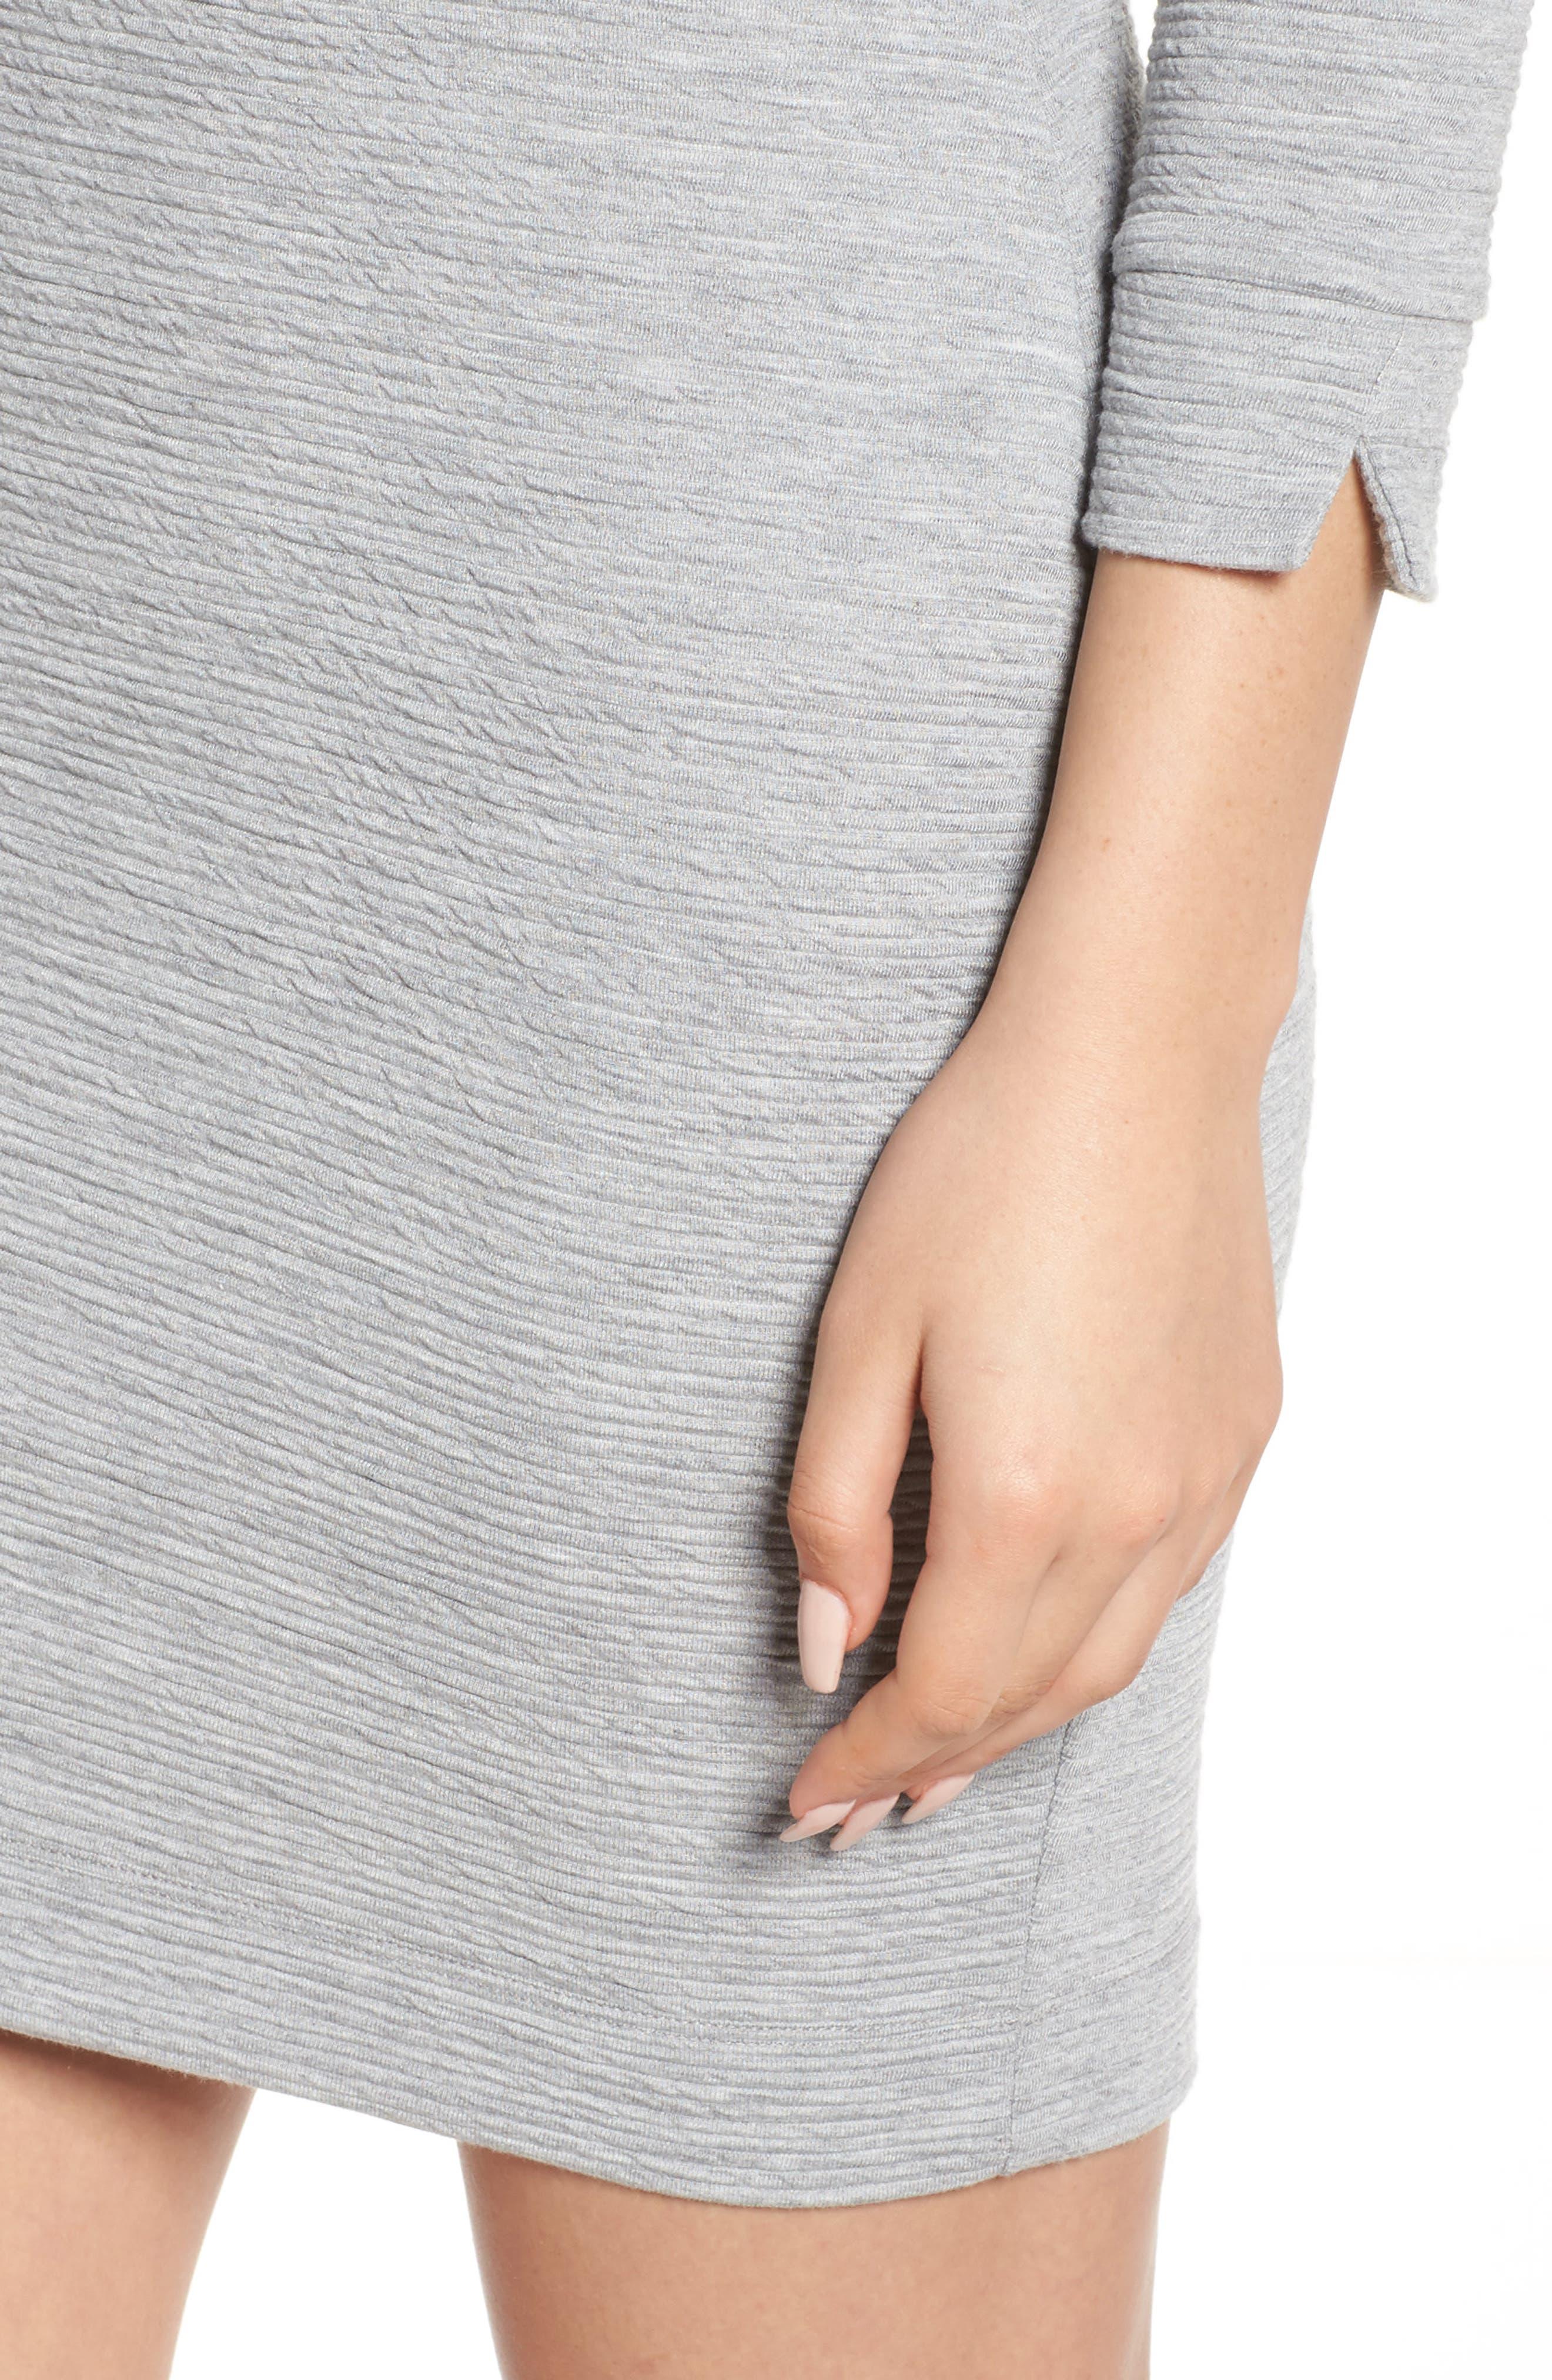 Sudan Marl Sheath Dress,                             Alternate thumbnail 4, color,                             Mid Grey Mel